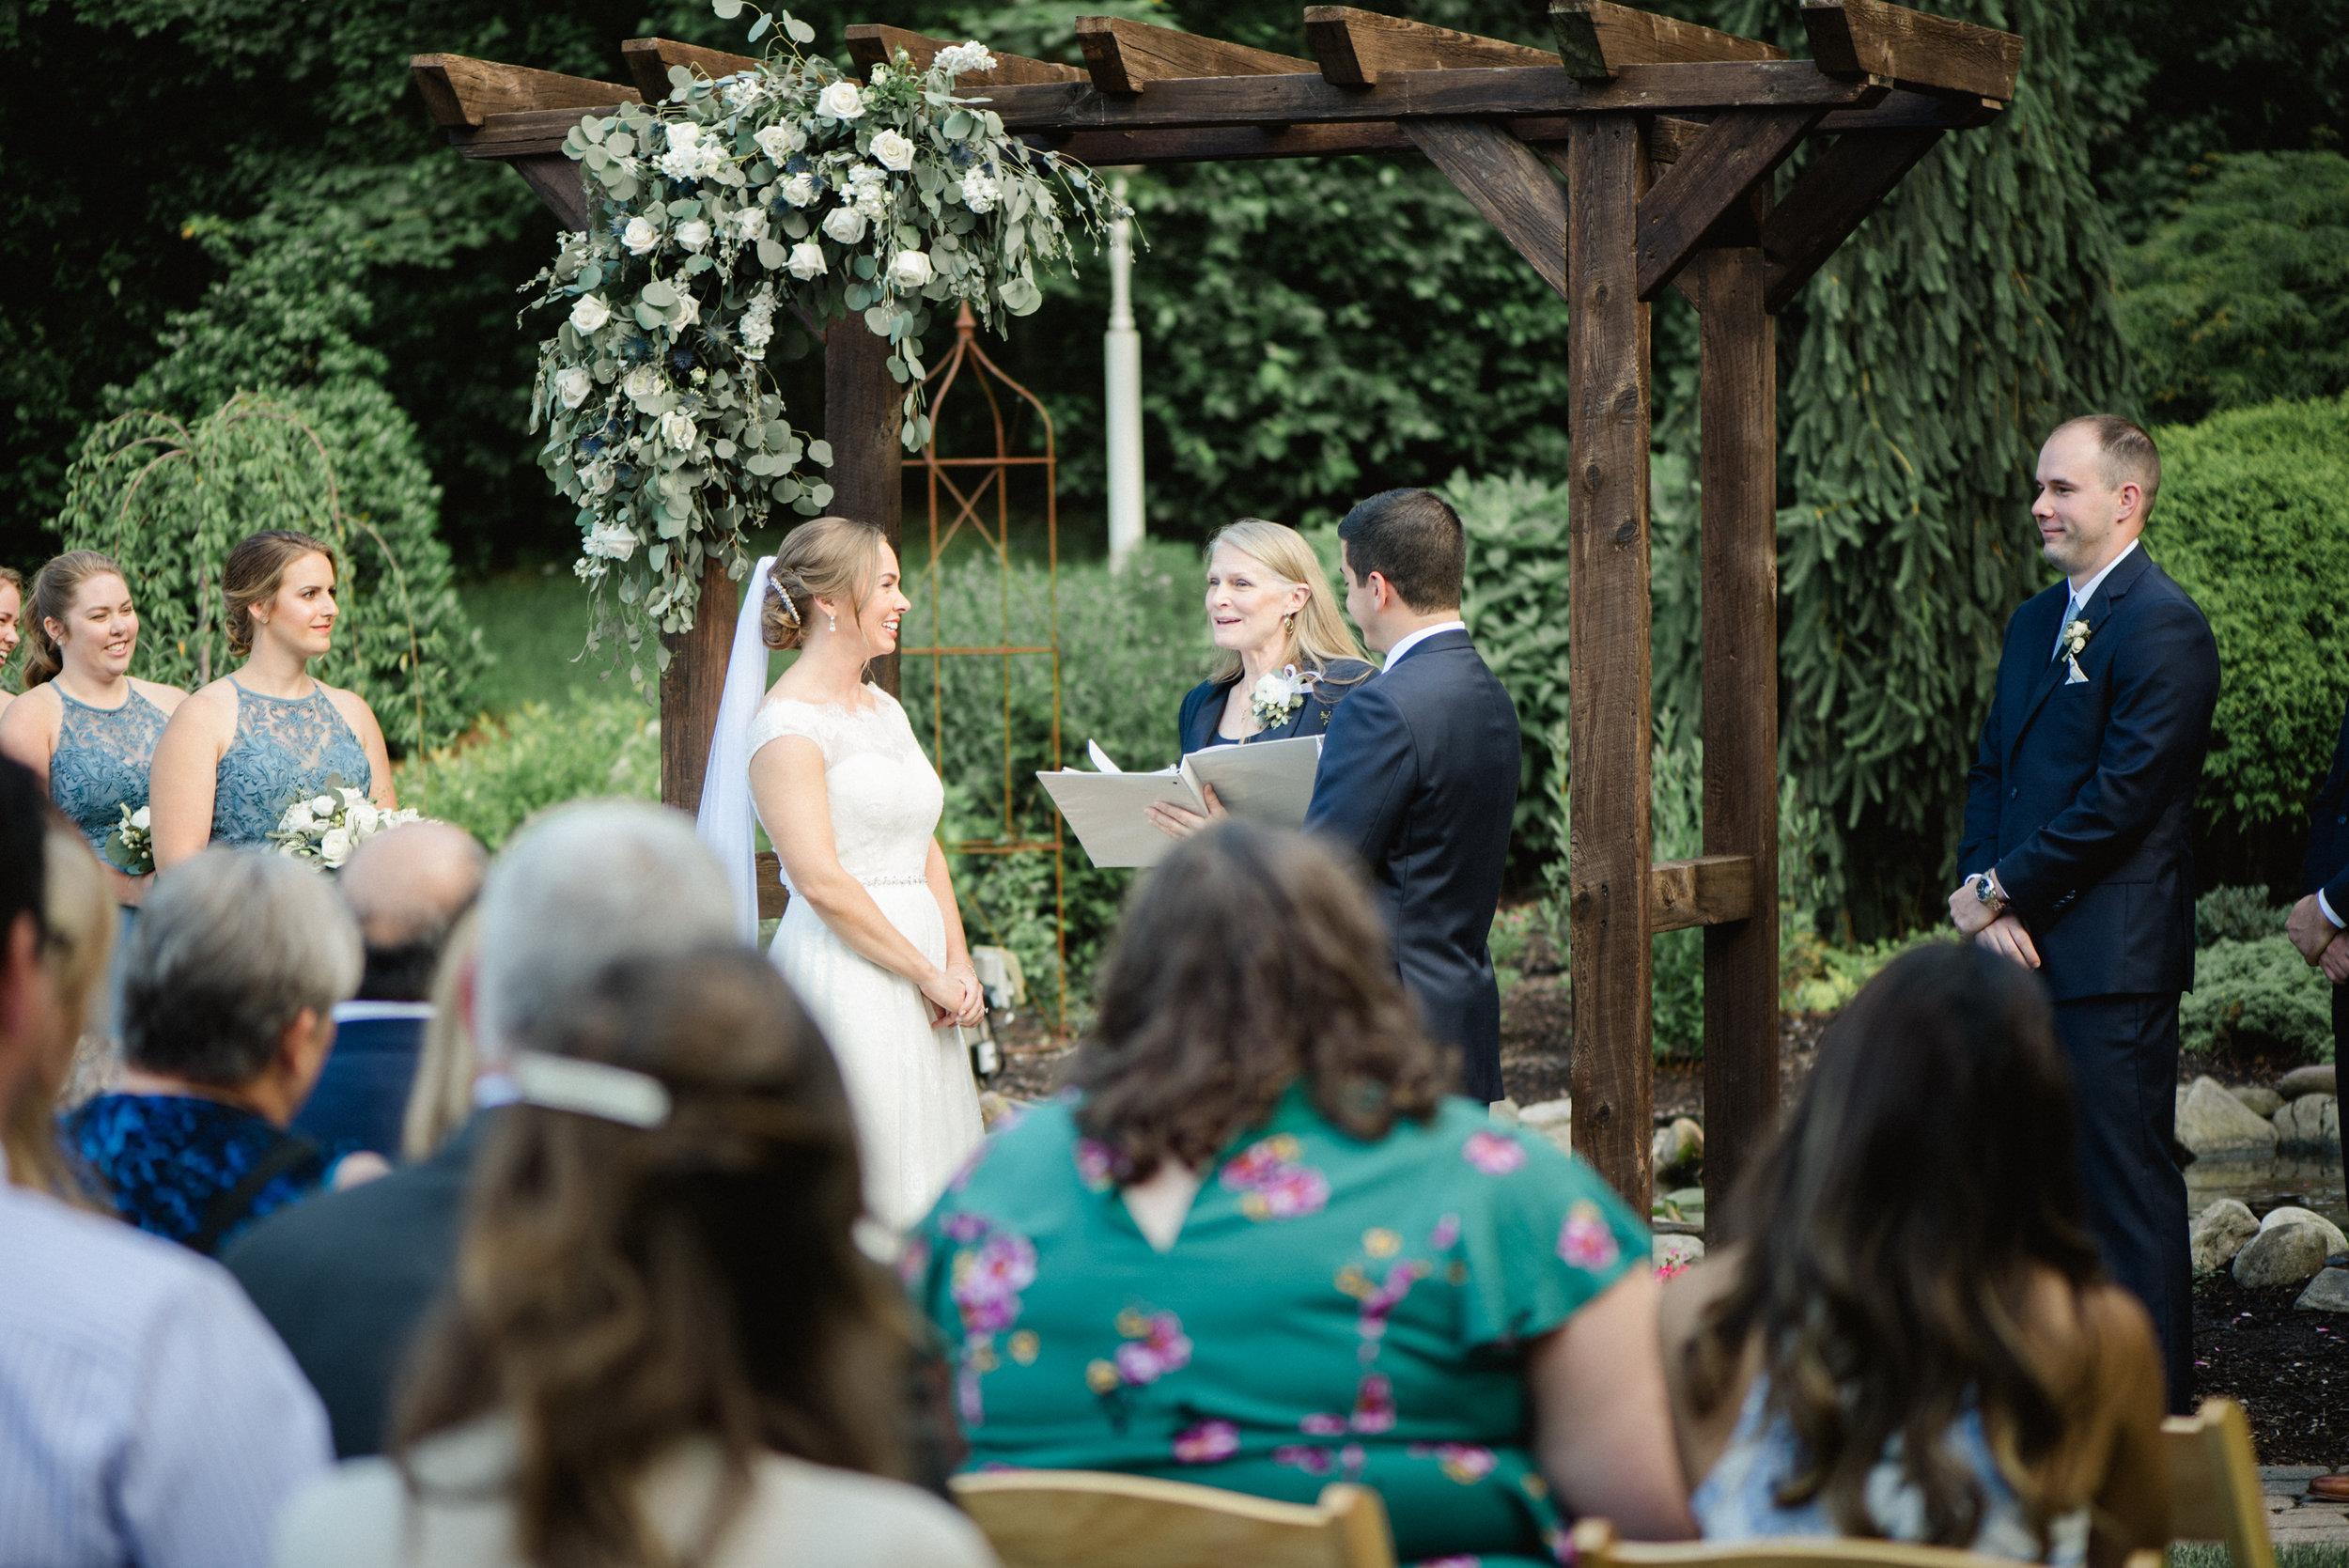 Constantino's Catering Event Venue Wedding Photos-133.jpg